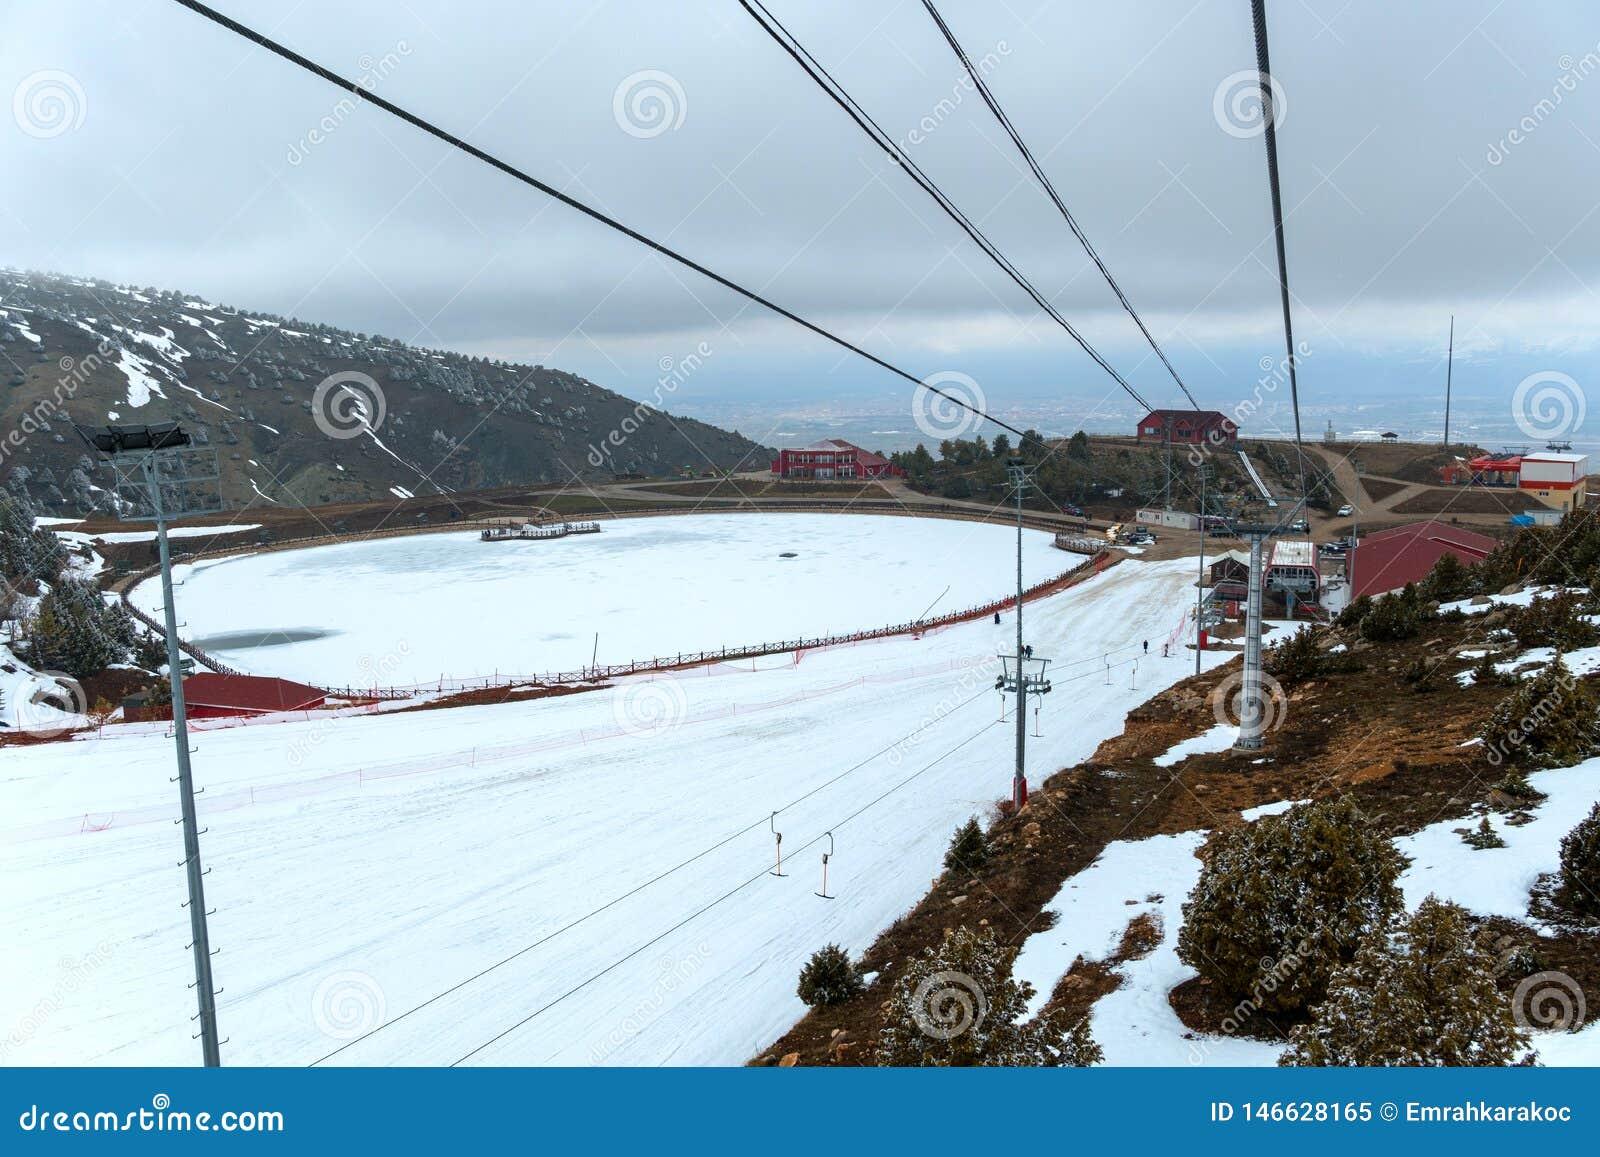 High Angel View Ski Center